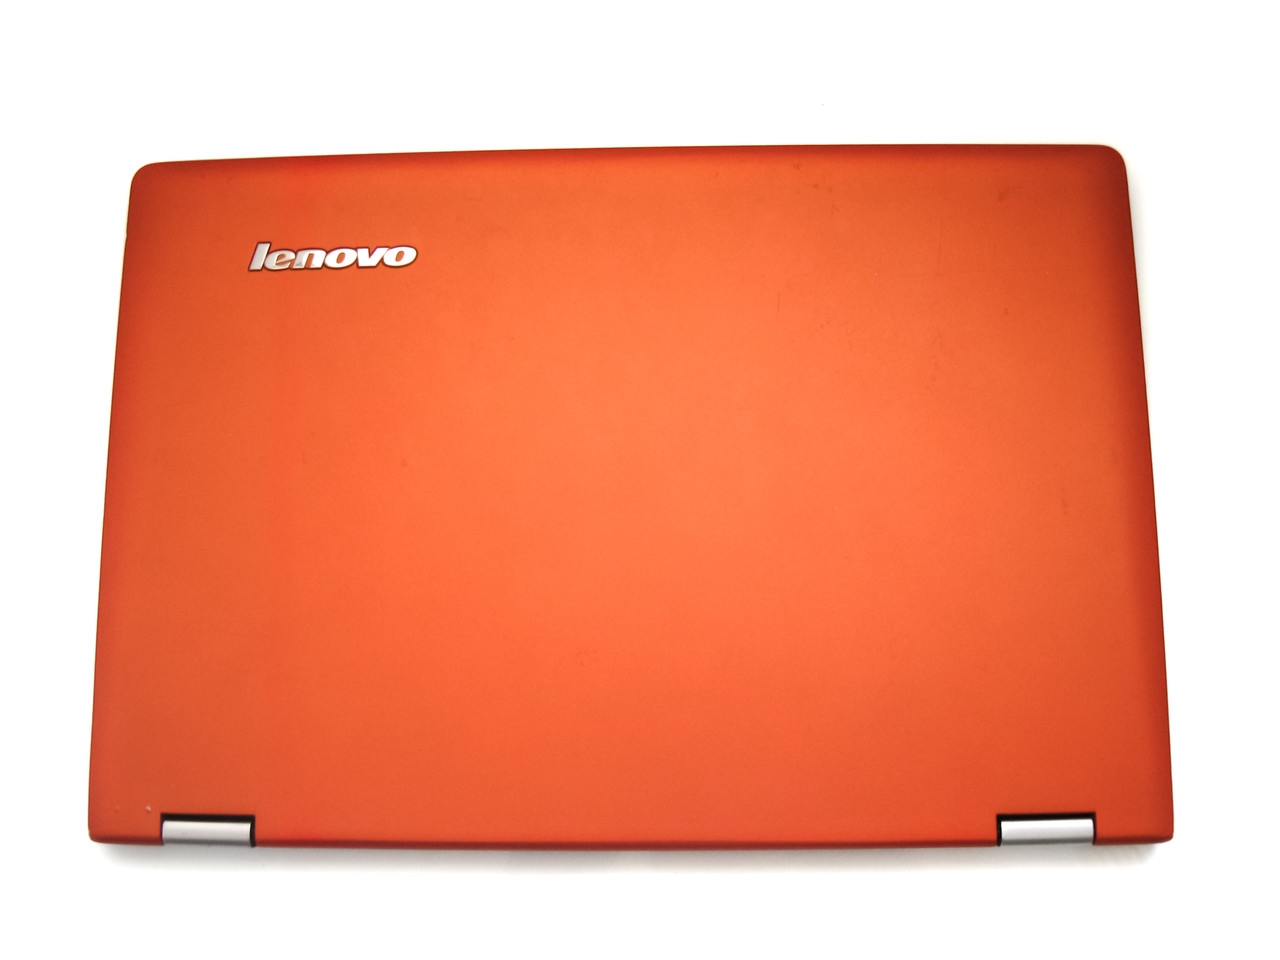 Трансформер Lenovo Yoga 13 IPS 13.3  (1600x900) / Intel Core i7-3517U  8